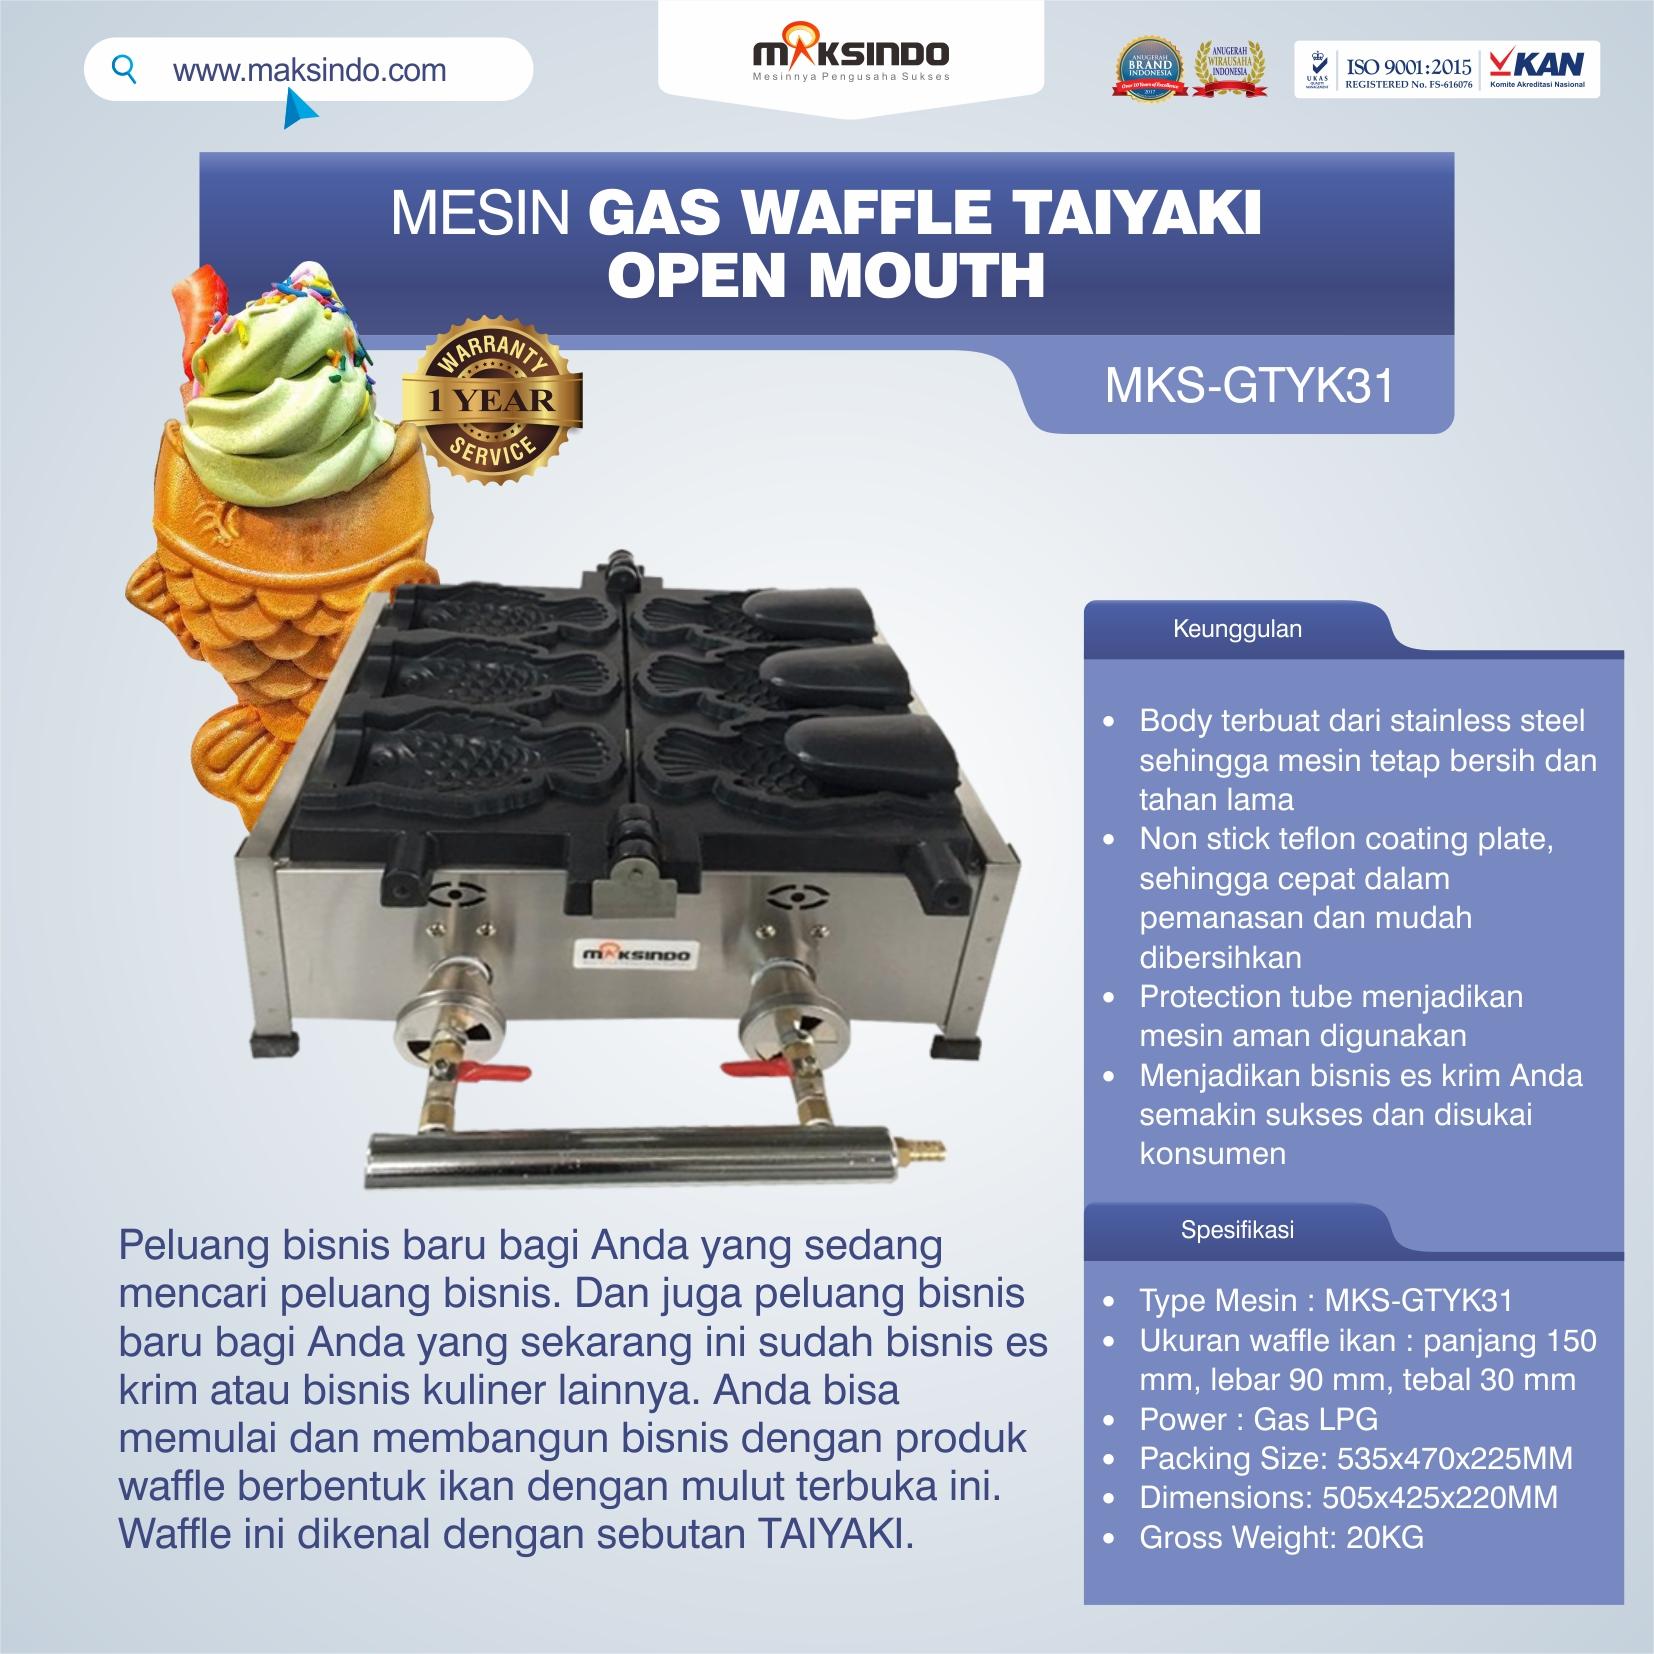 Jual Mesin Gas Waffle Taiyaki Open Mouth (GTYK31) di Semarang